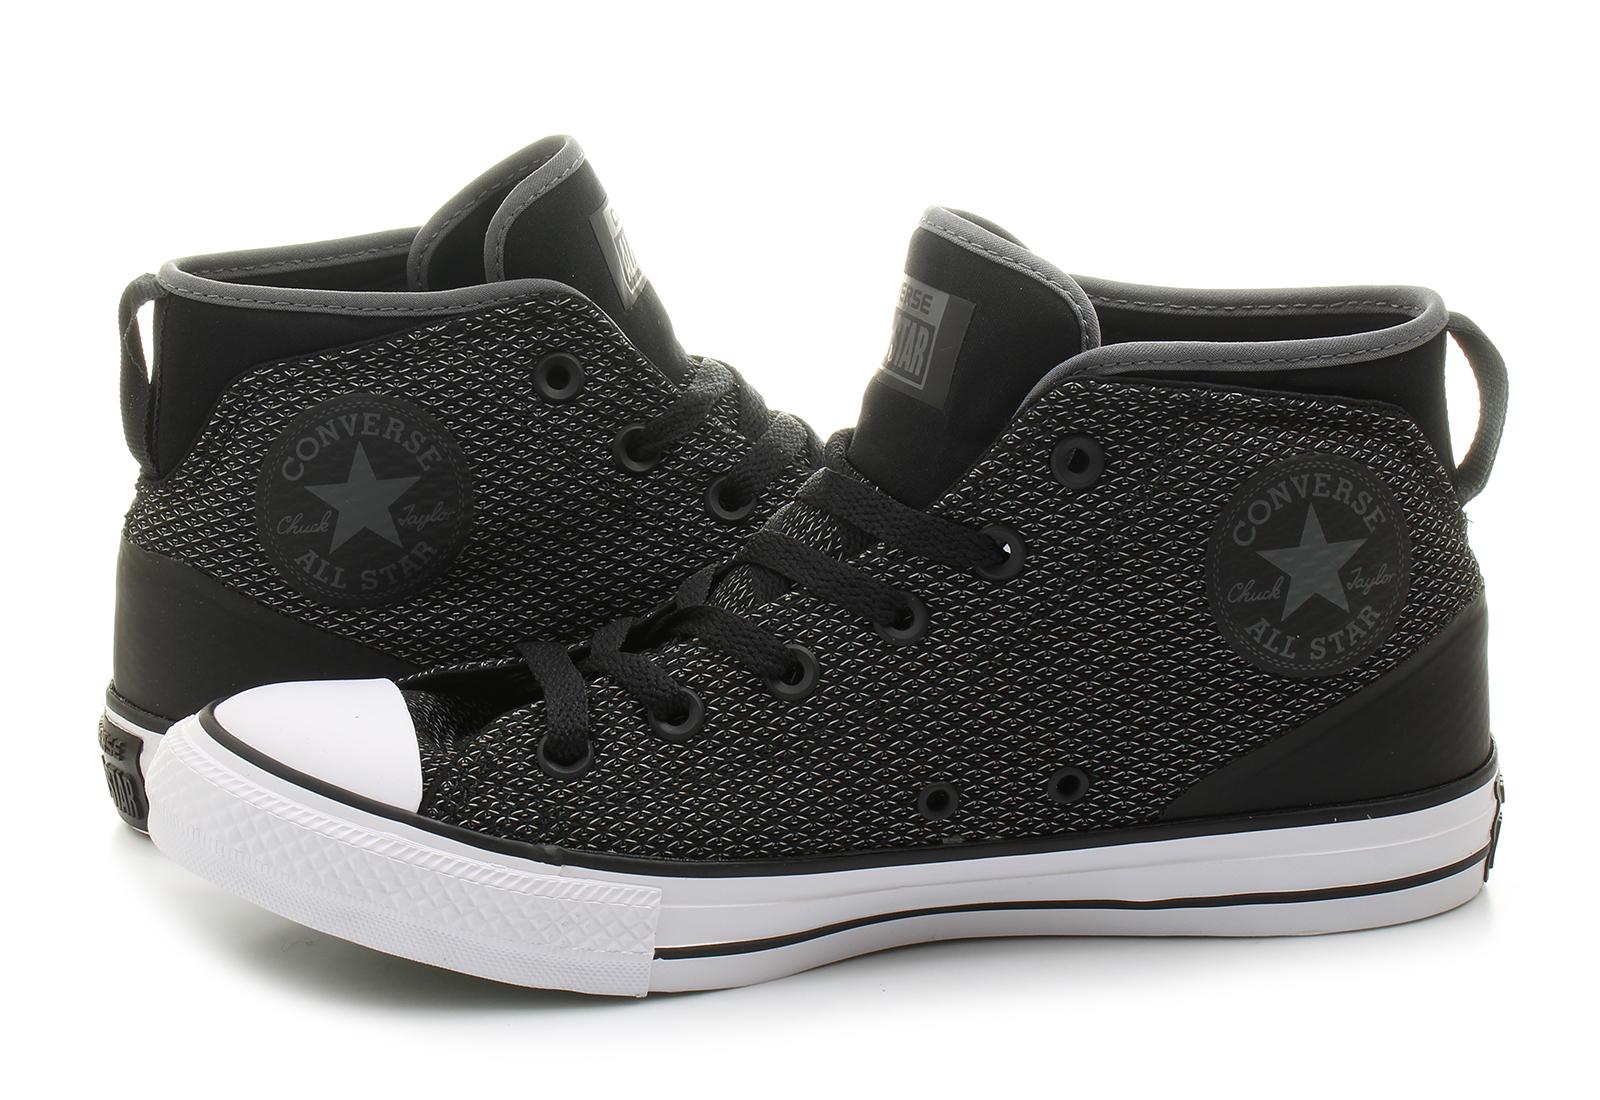 Converse Sneakers - Chuck Taylor All Star Syde Street - 155483C ... 4cb5d5f0e0